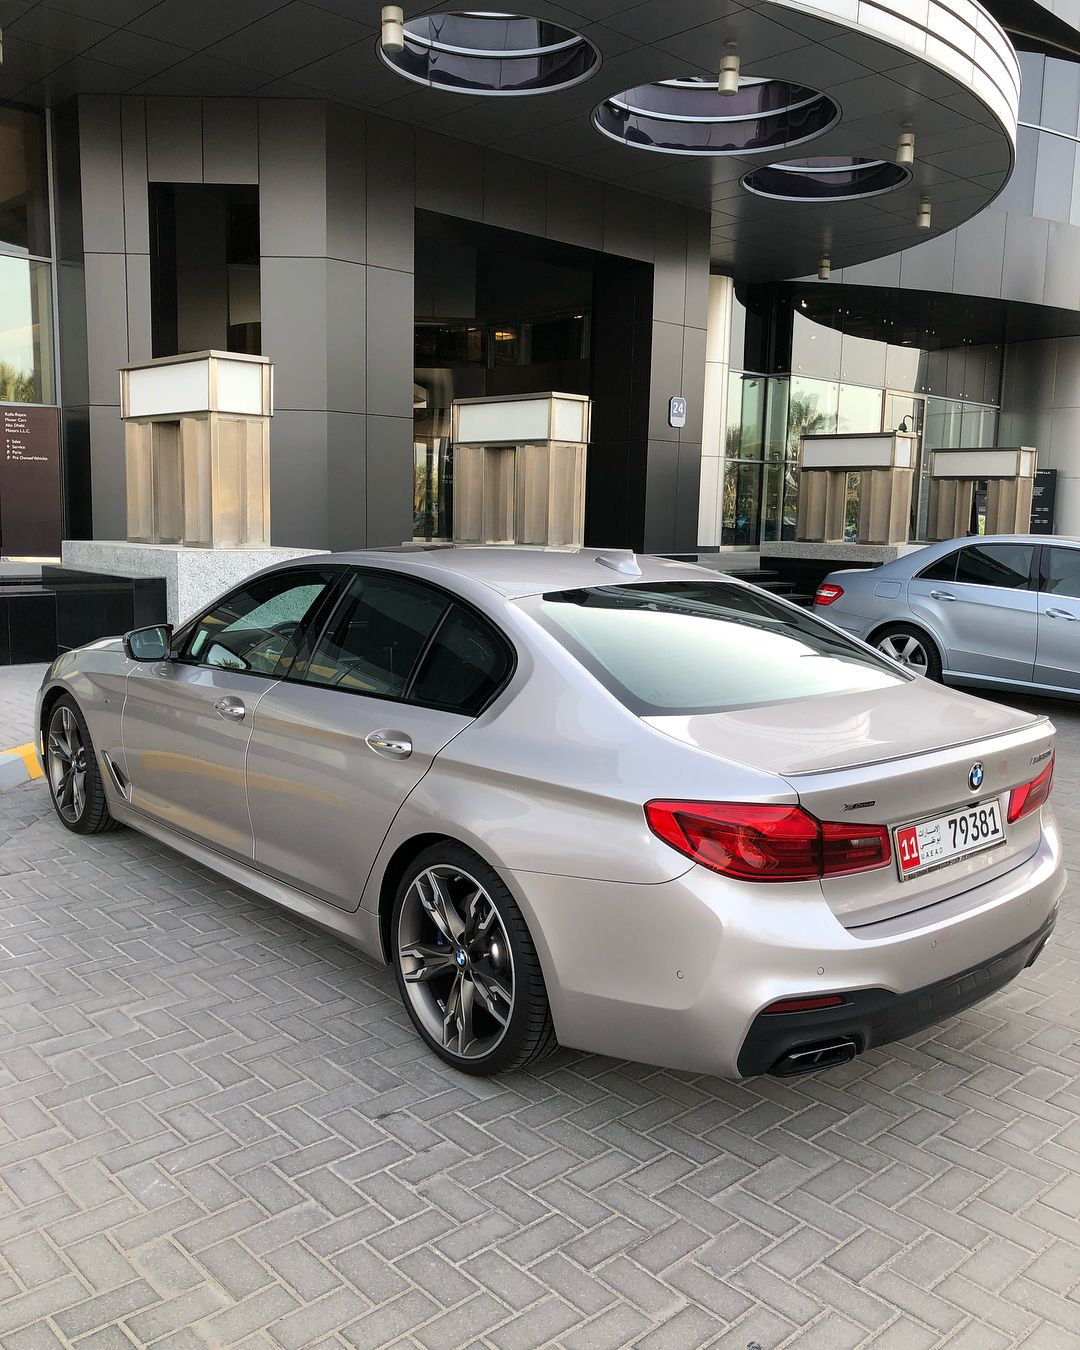 Bmw 550i M Performance Color Rhodonite Silver V8 44 L 462 Hp 0 100